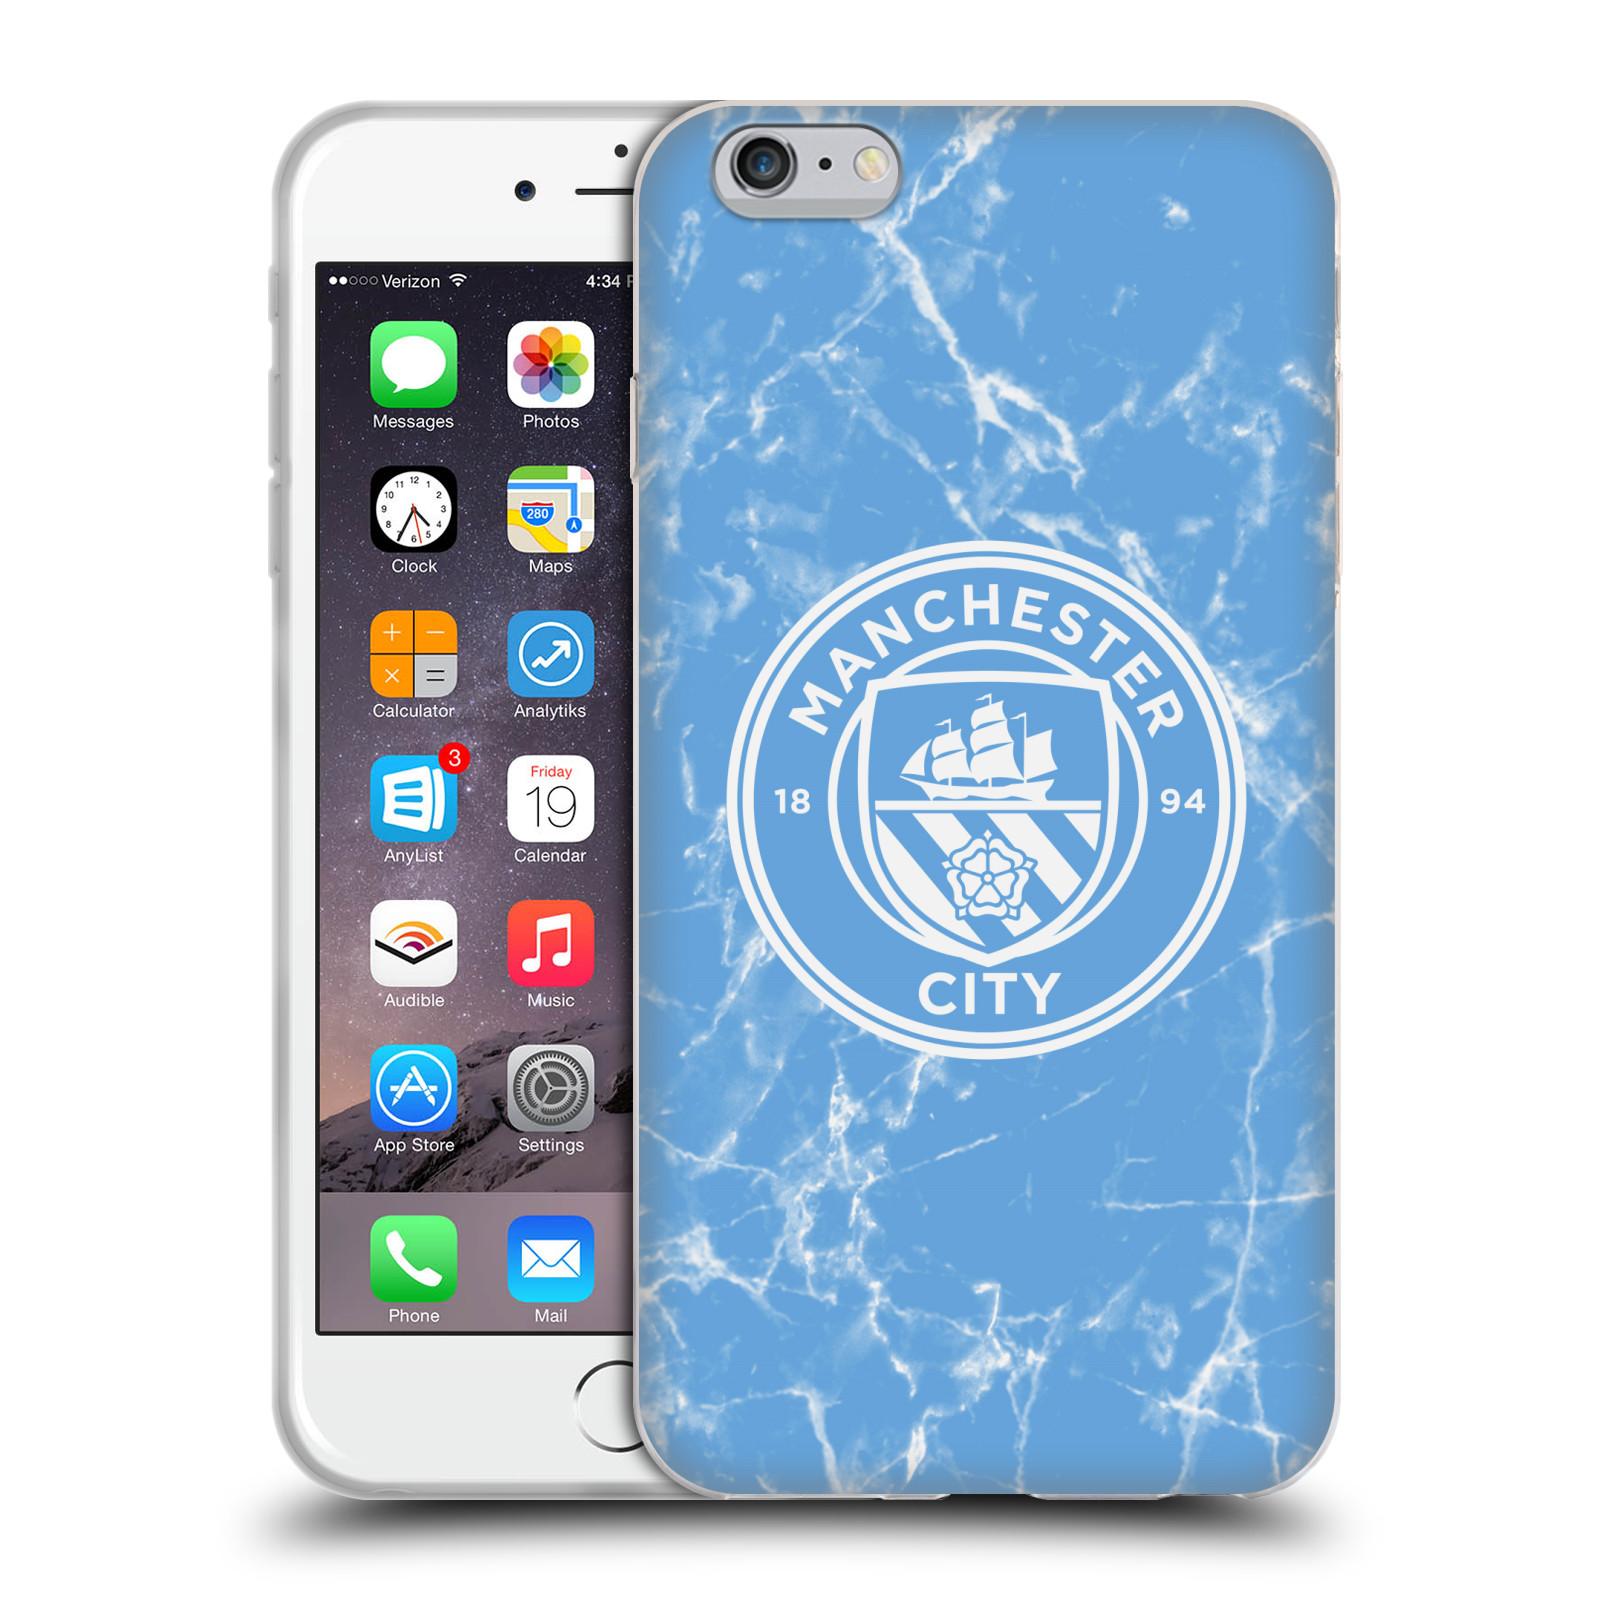 HEAD CASE silikonový obal na mobil Apple Iphone 6/6S PLUS Fotbalový klub Manchester City modrý mramor